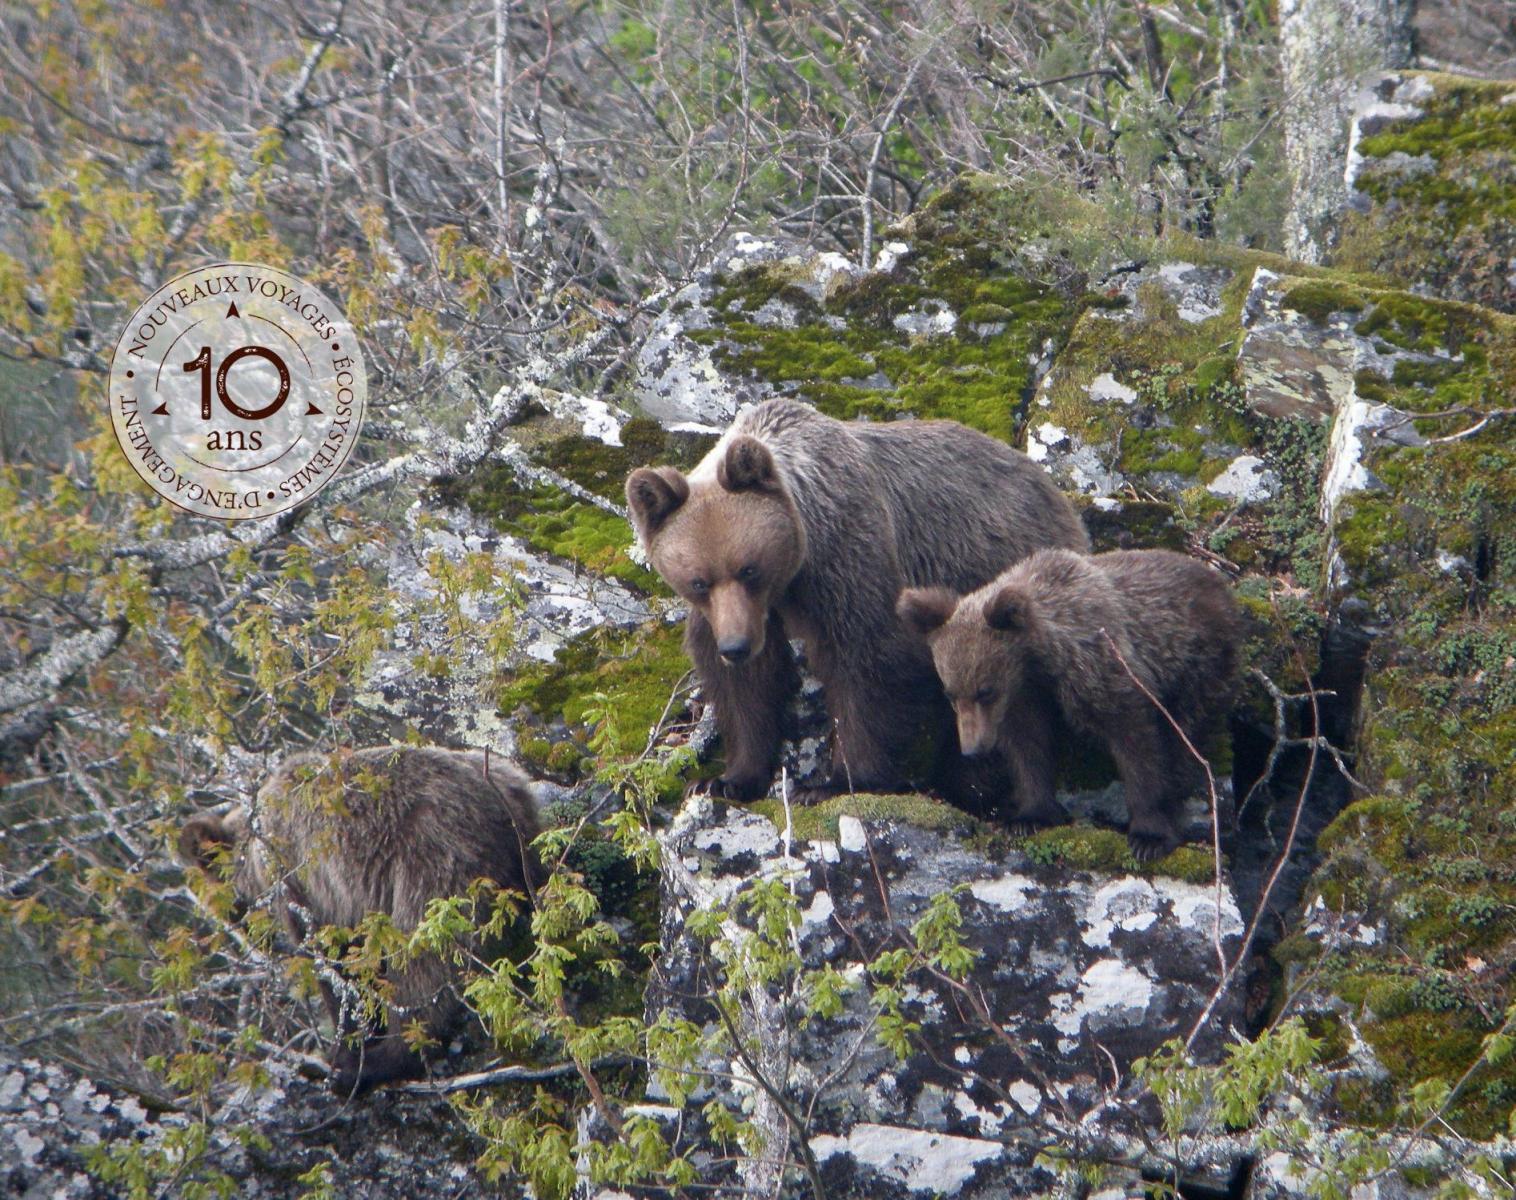 Espagne  Toute l'Espagne au printemps : spécial grands carnivores   Observation nature Balade nature